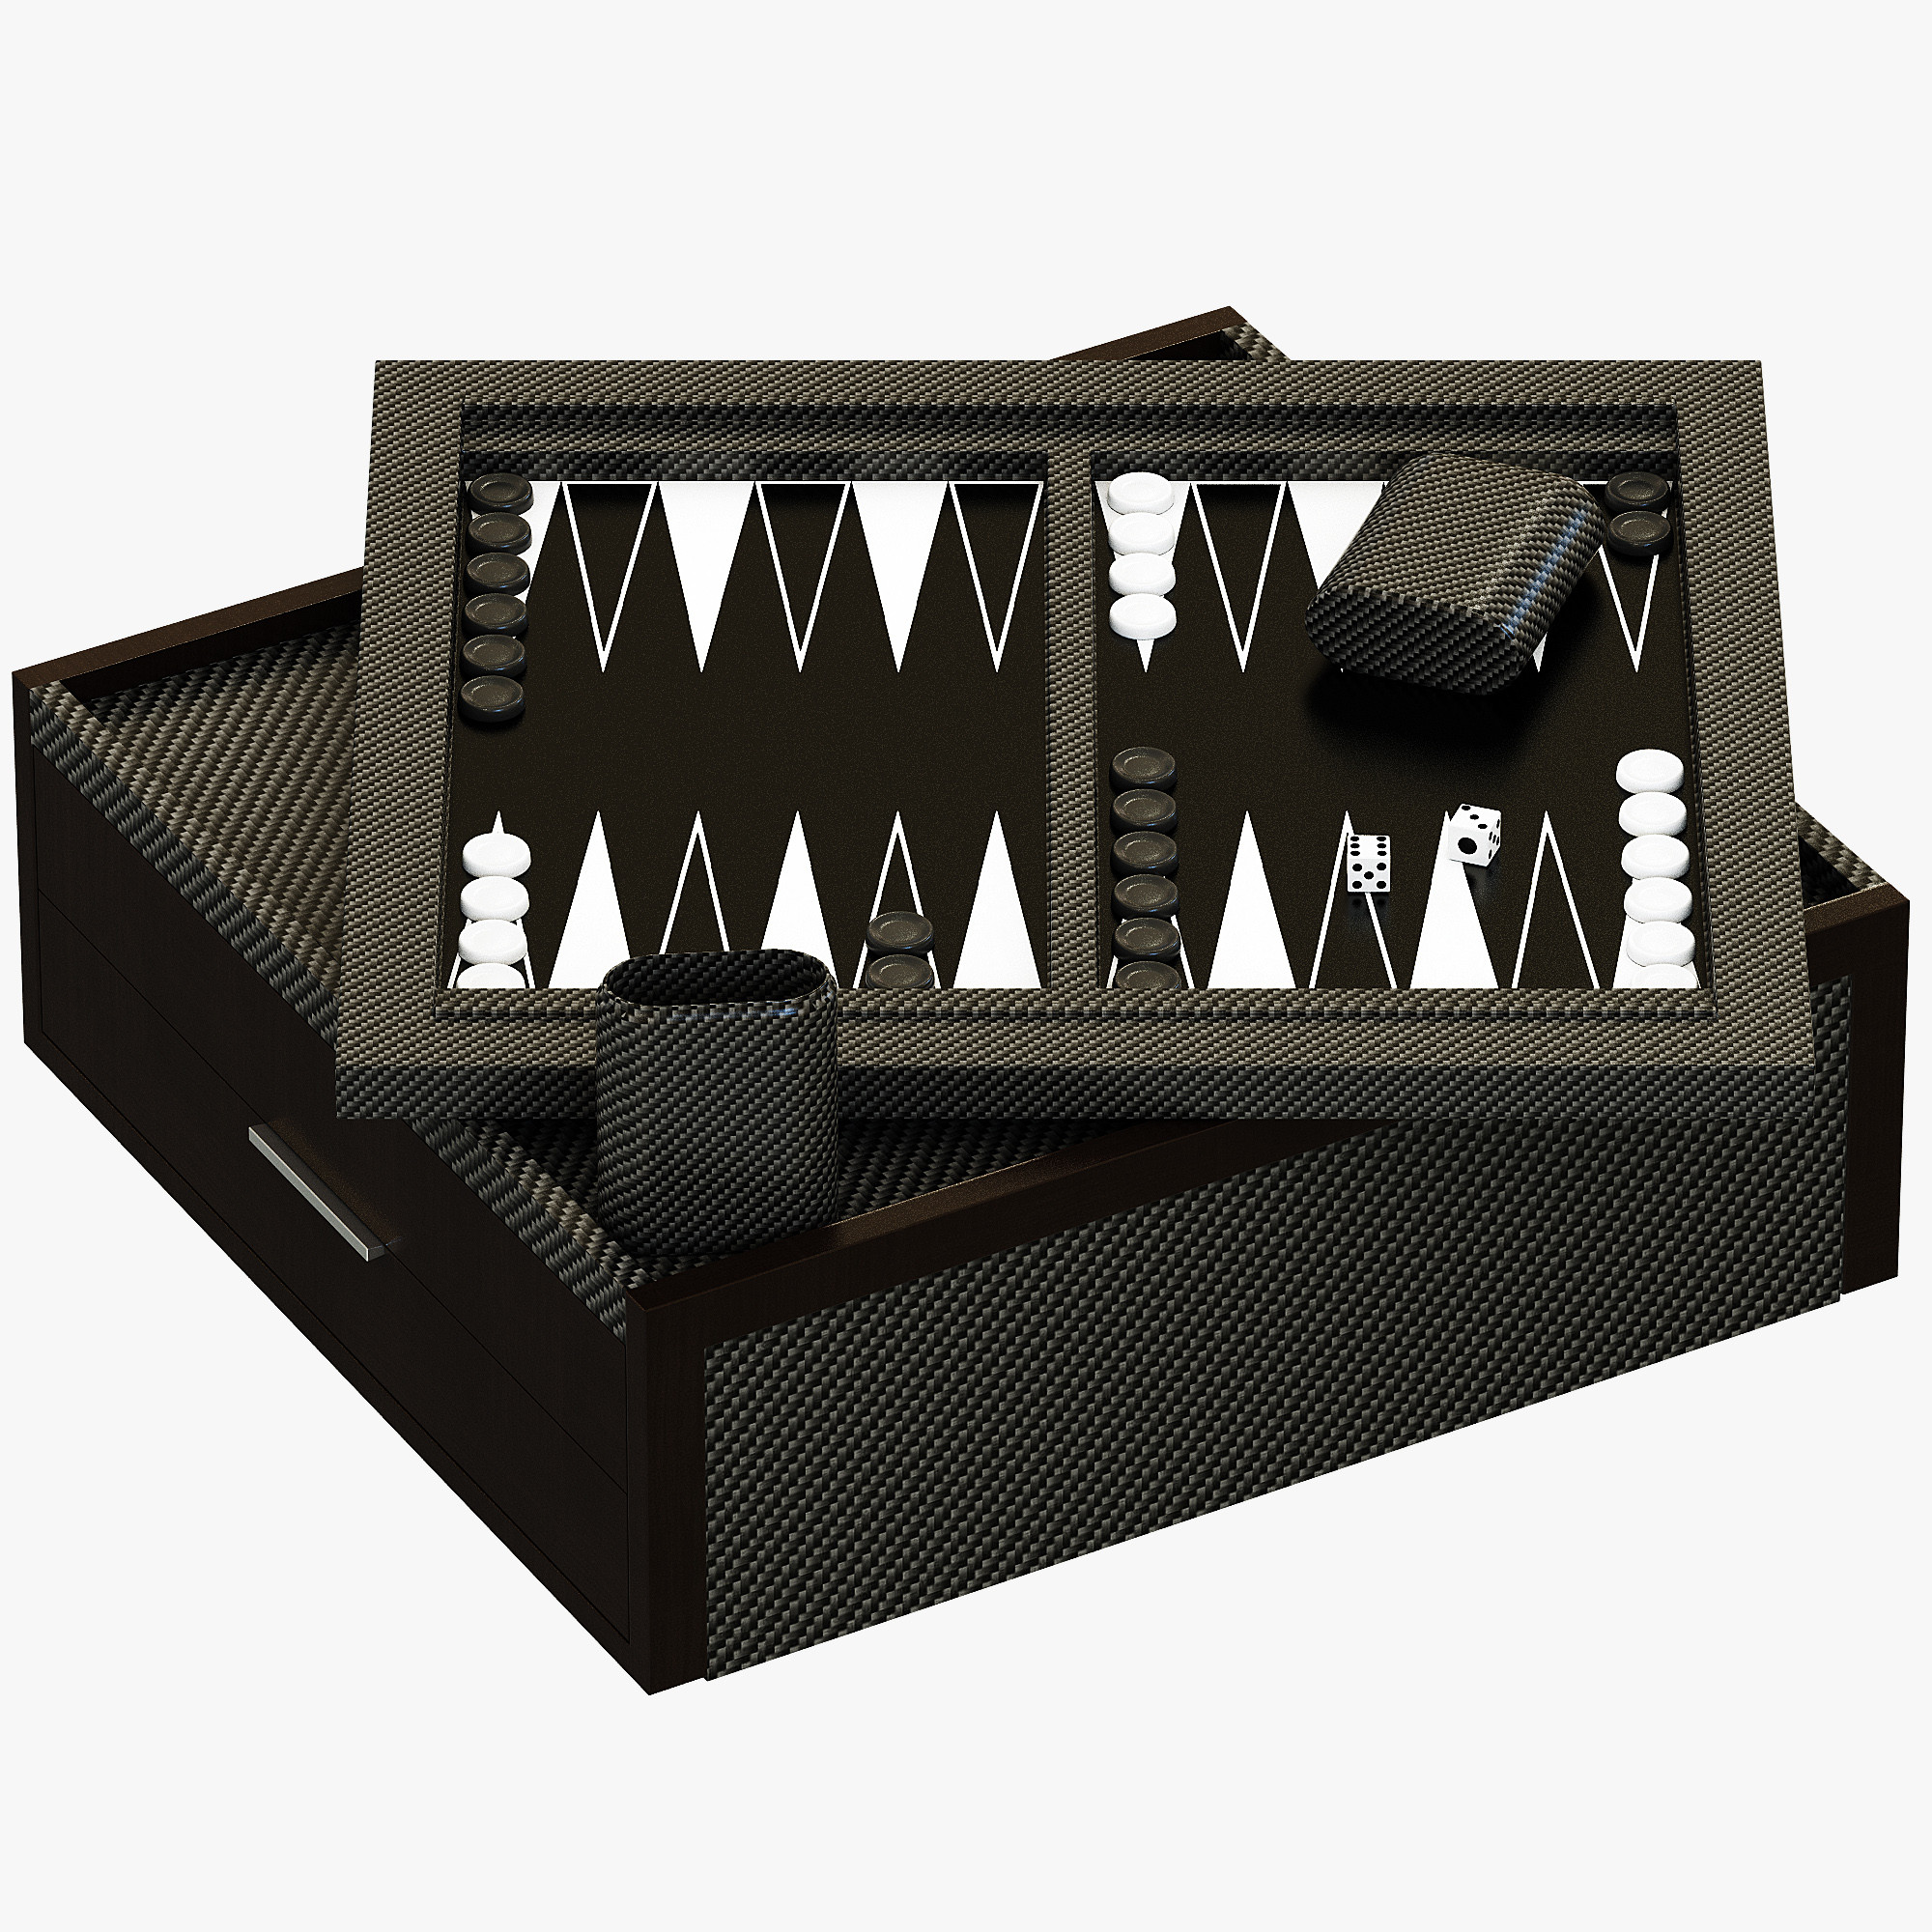 Ralph Lauren BOND 5-IN-1 GAME BOX3.jpg